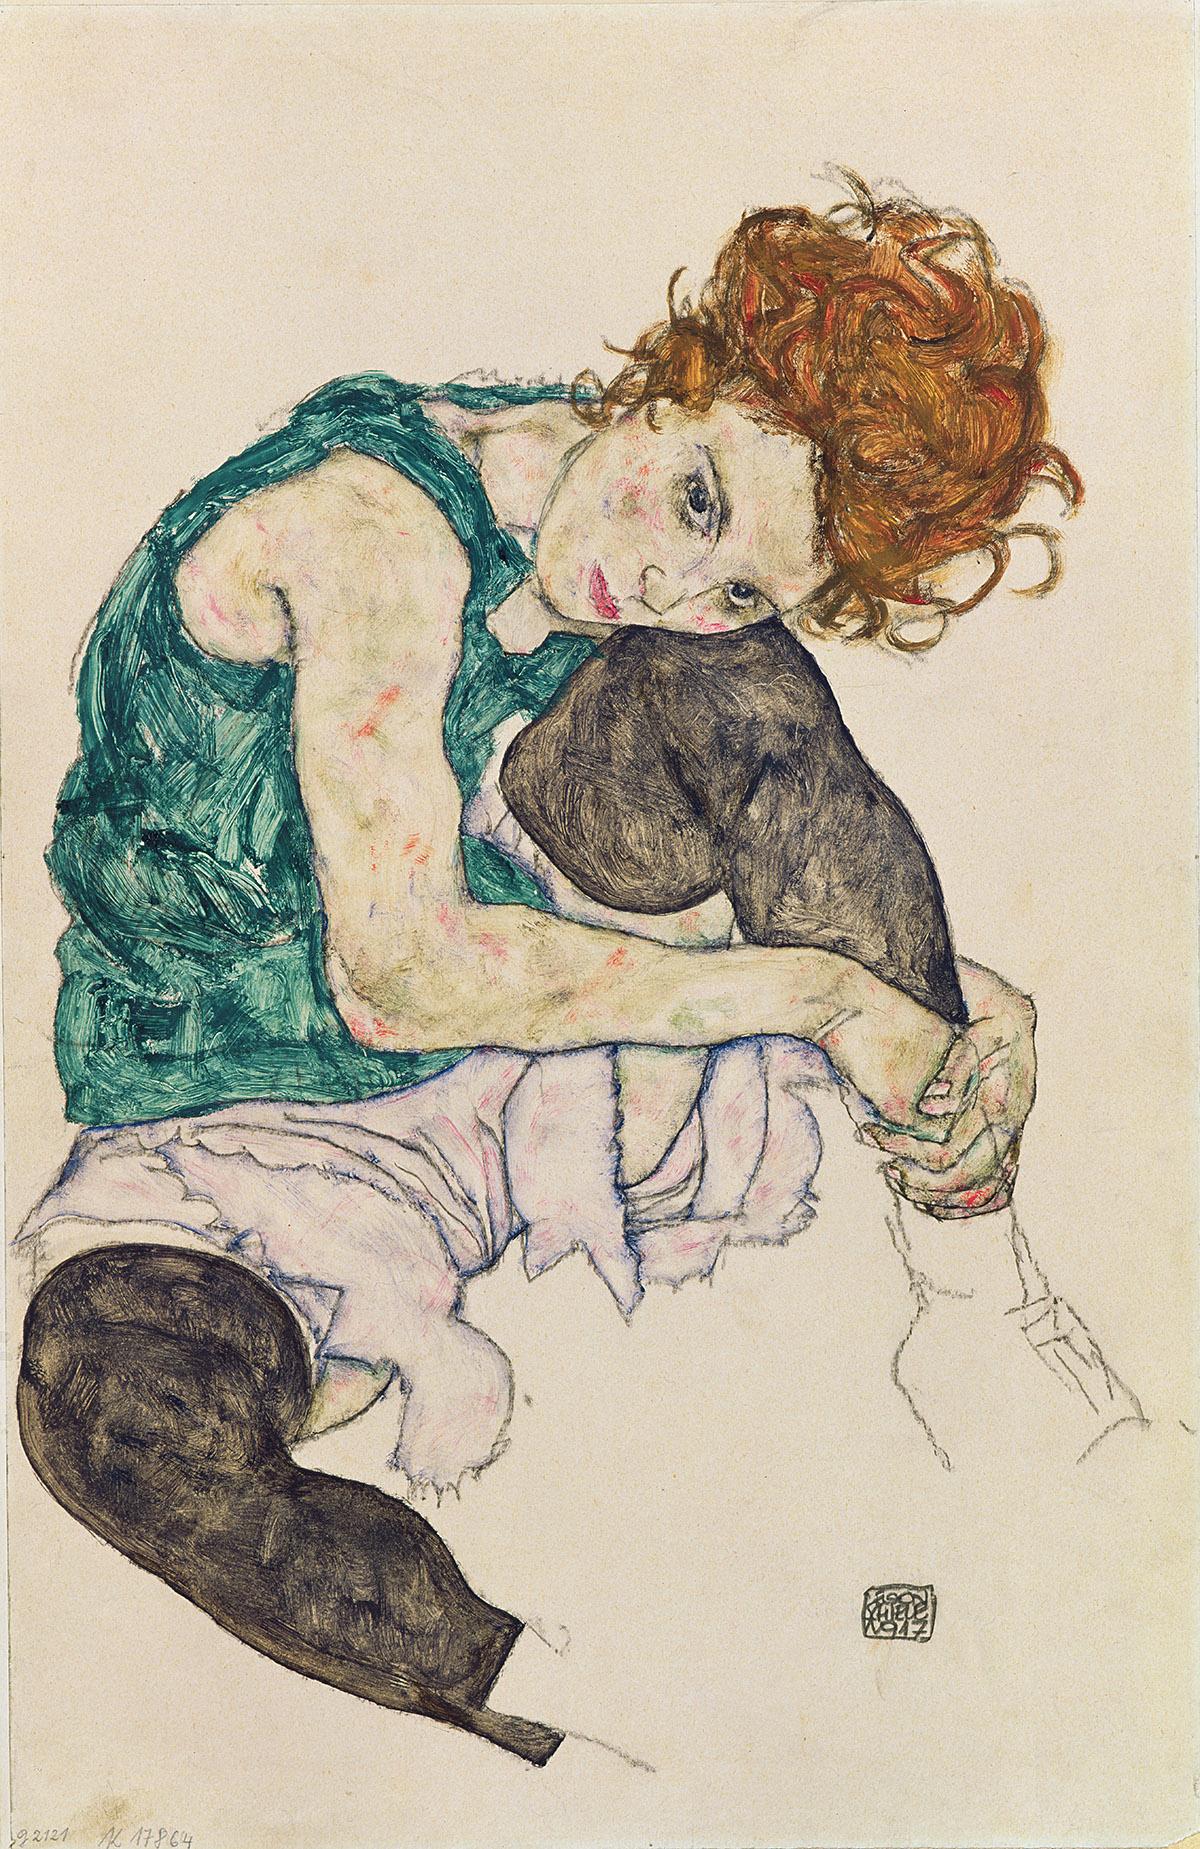 Image Credit: Seated Woman with Bent Knee, 1917 (gouache, w/c and black crayon on paper), Schiele, Egon (1890-1918) / Narodni Galerie, Prague, Czech Republic / Bridgeman Images